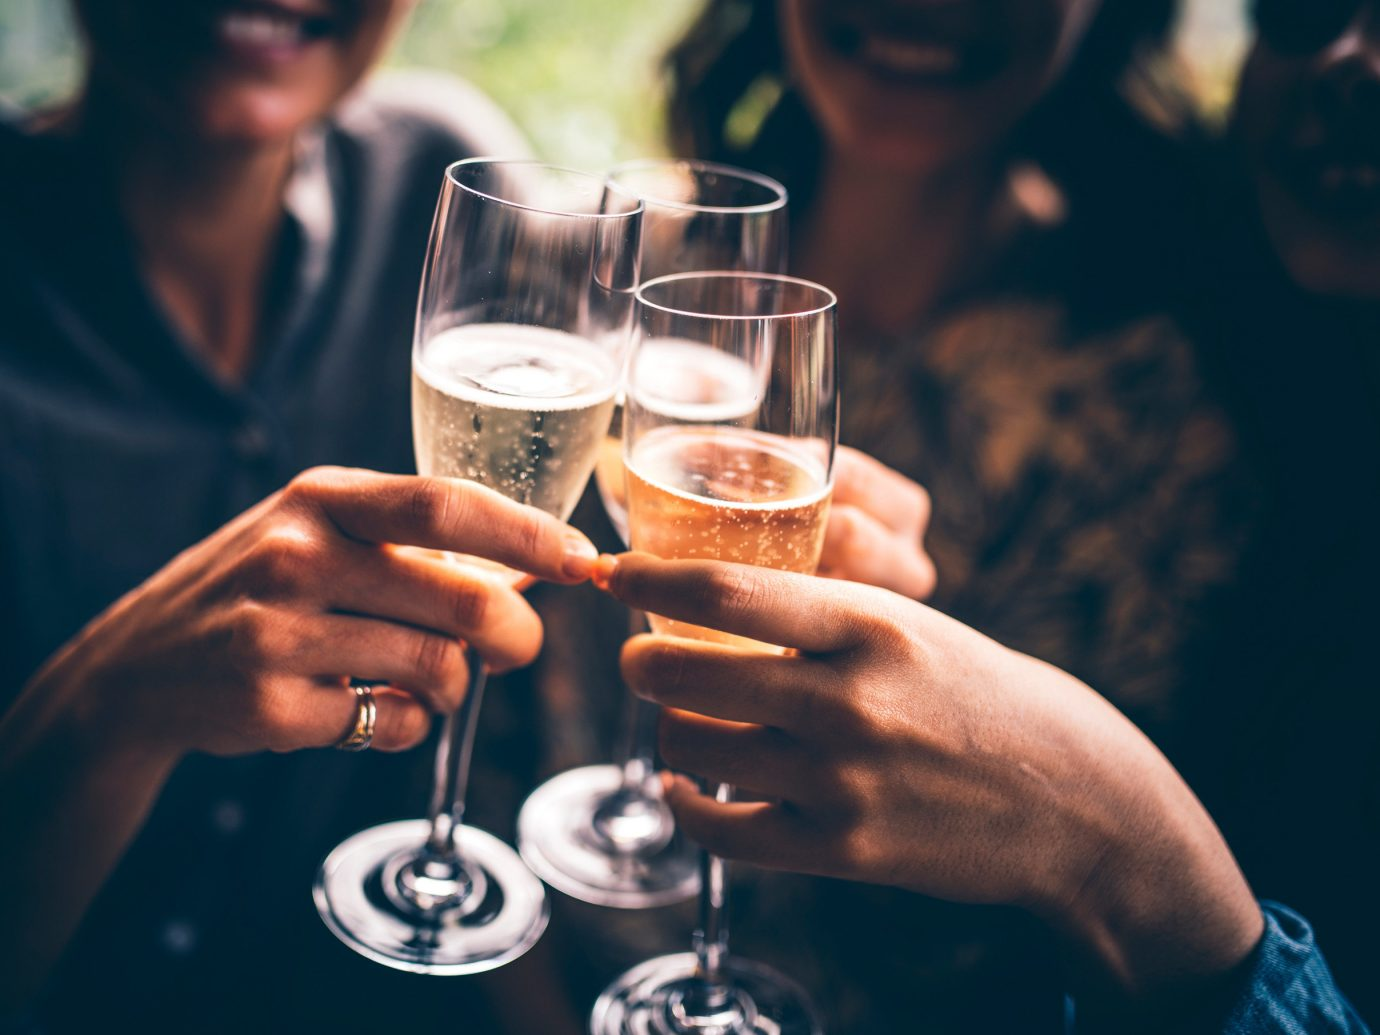 Jetsetter Guides person wine Drink glass alcohol alcoholic beverage distilled beverage sense wine glass beverage